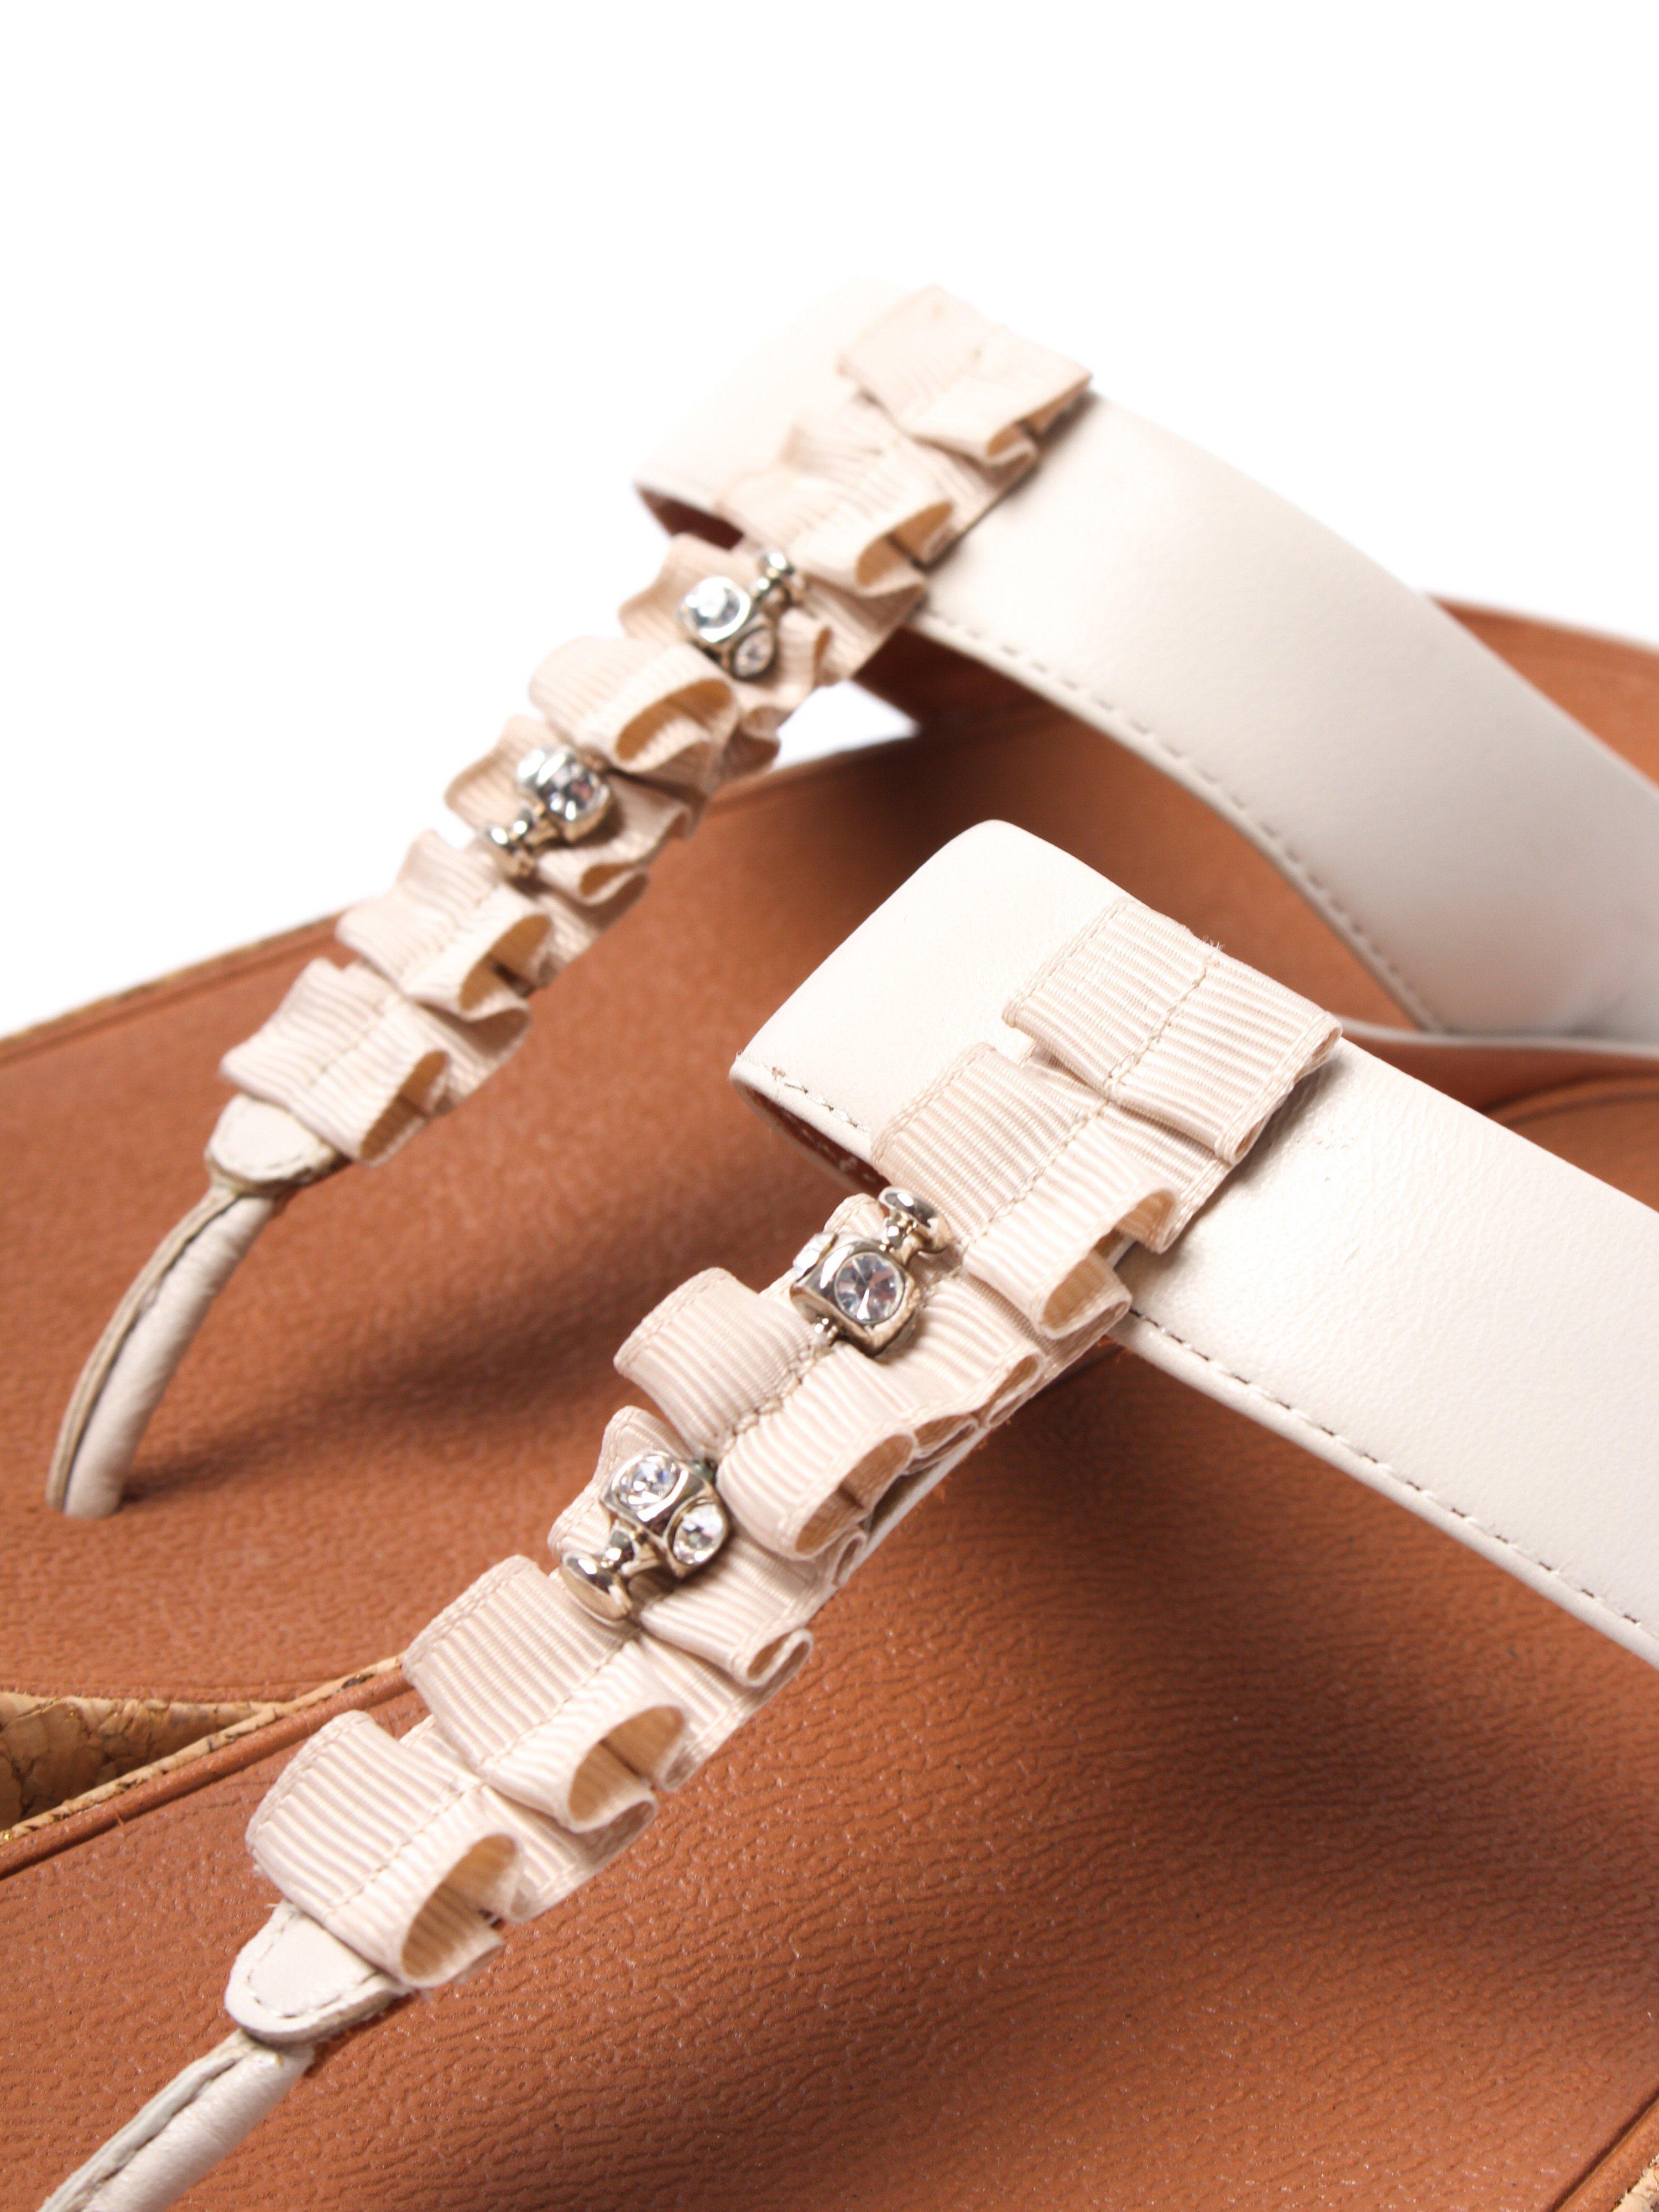 FitFlop Women's Ruffle Toe-Thong Sandals - Cream